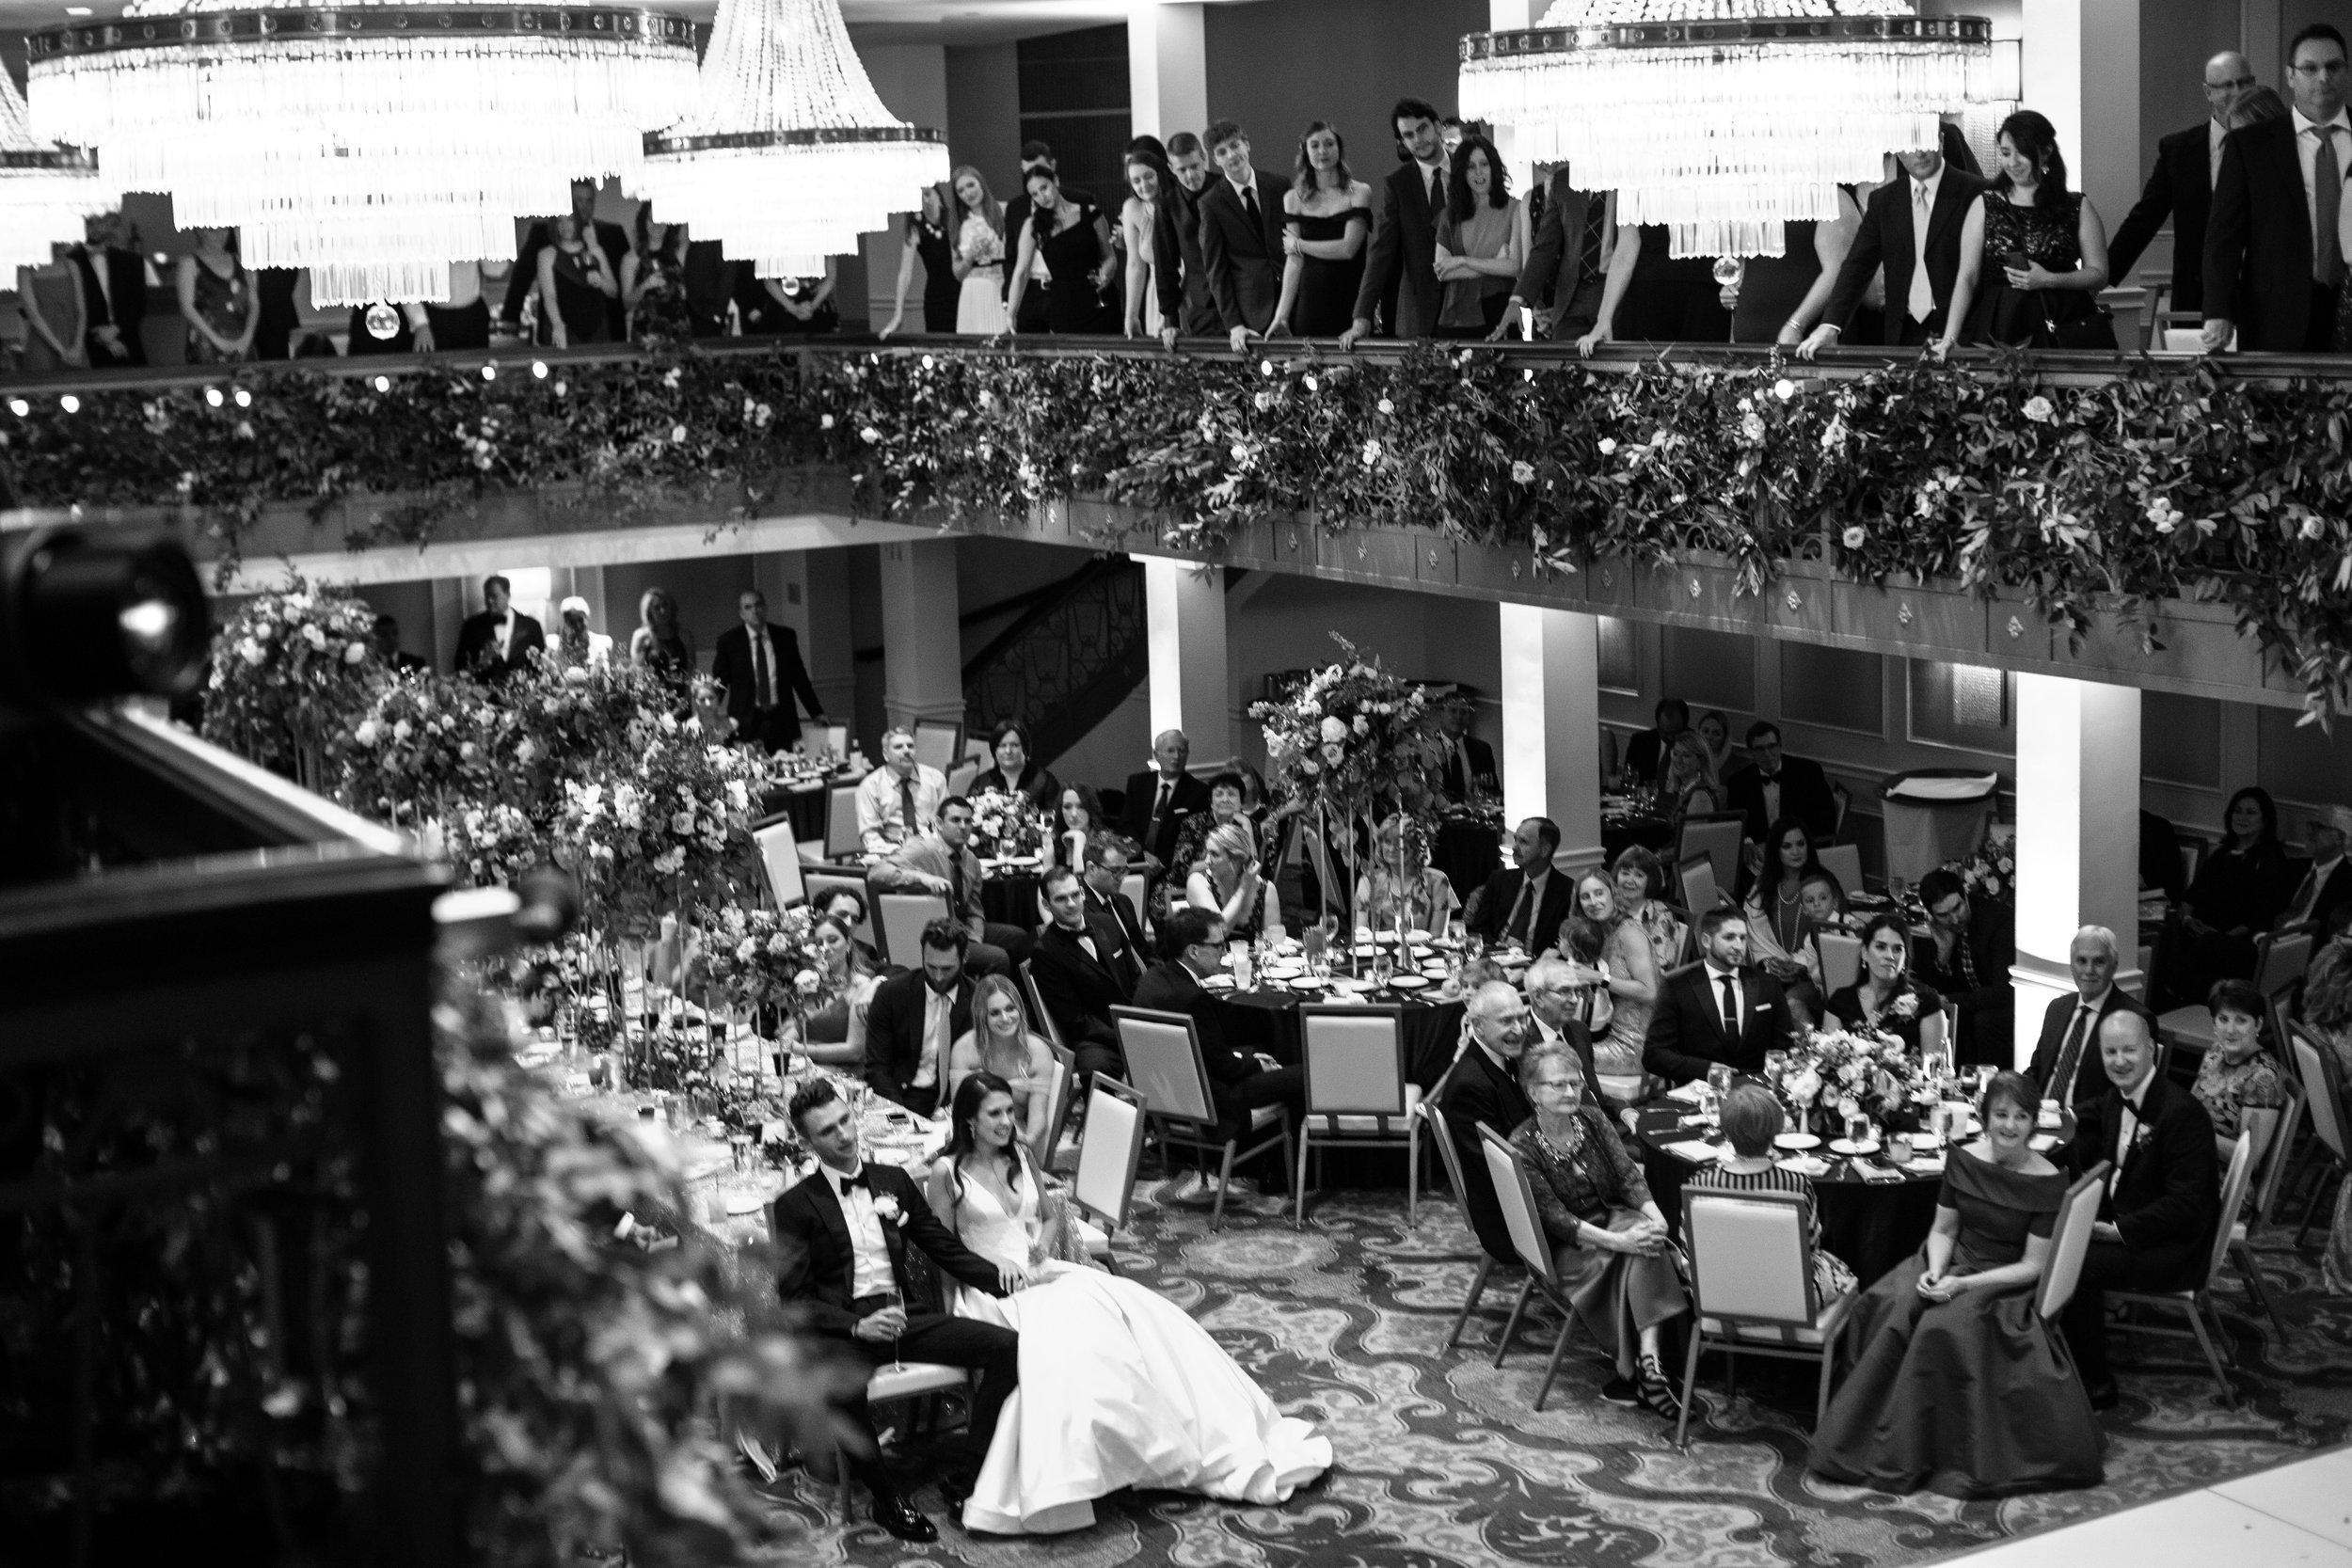 st-anthony-hotel-wedding-photography-10145san-antonio.JPG